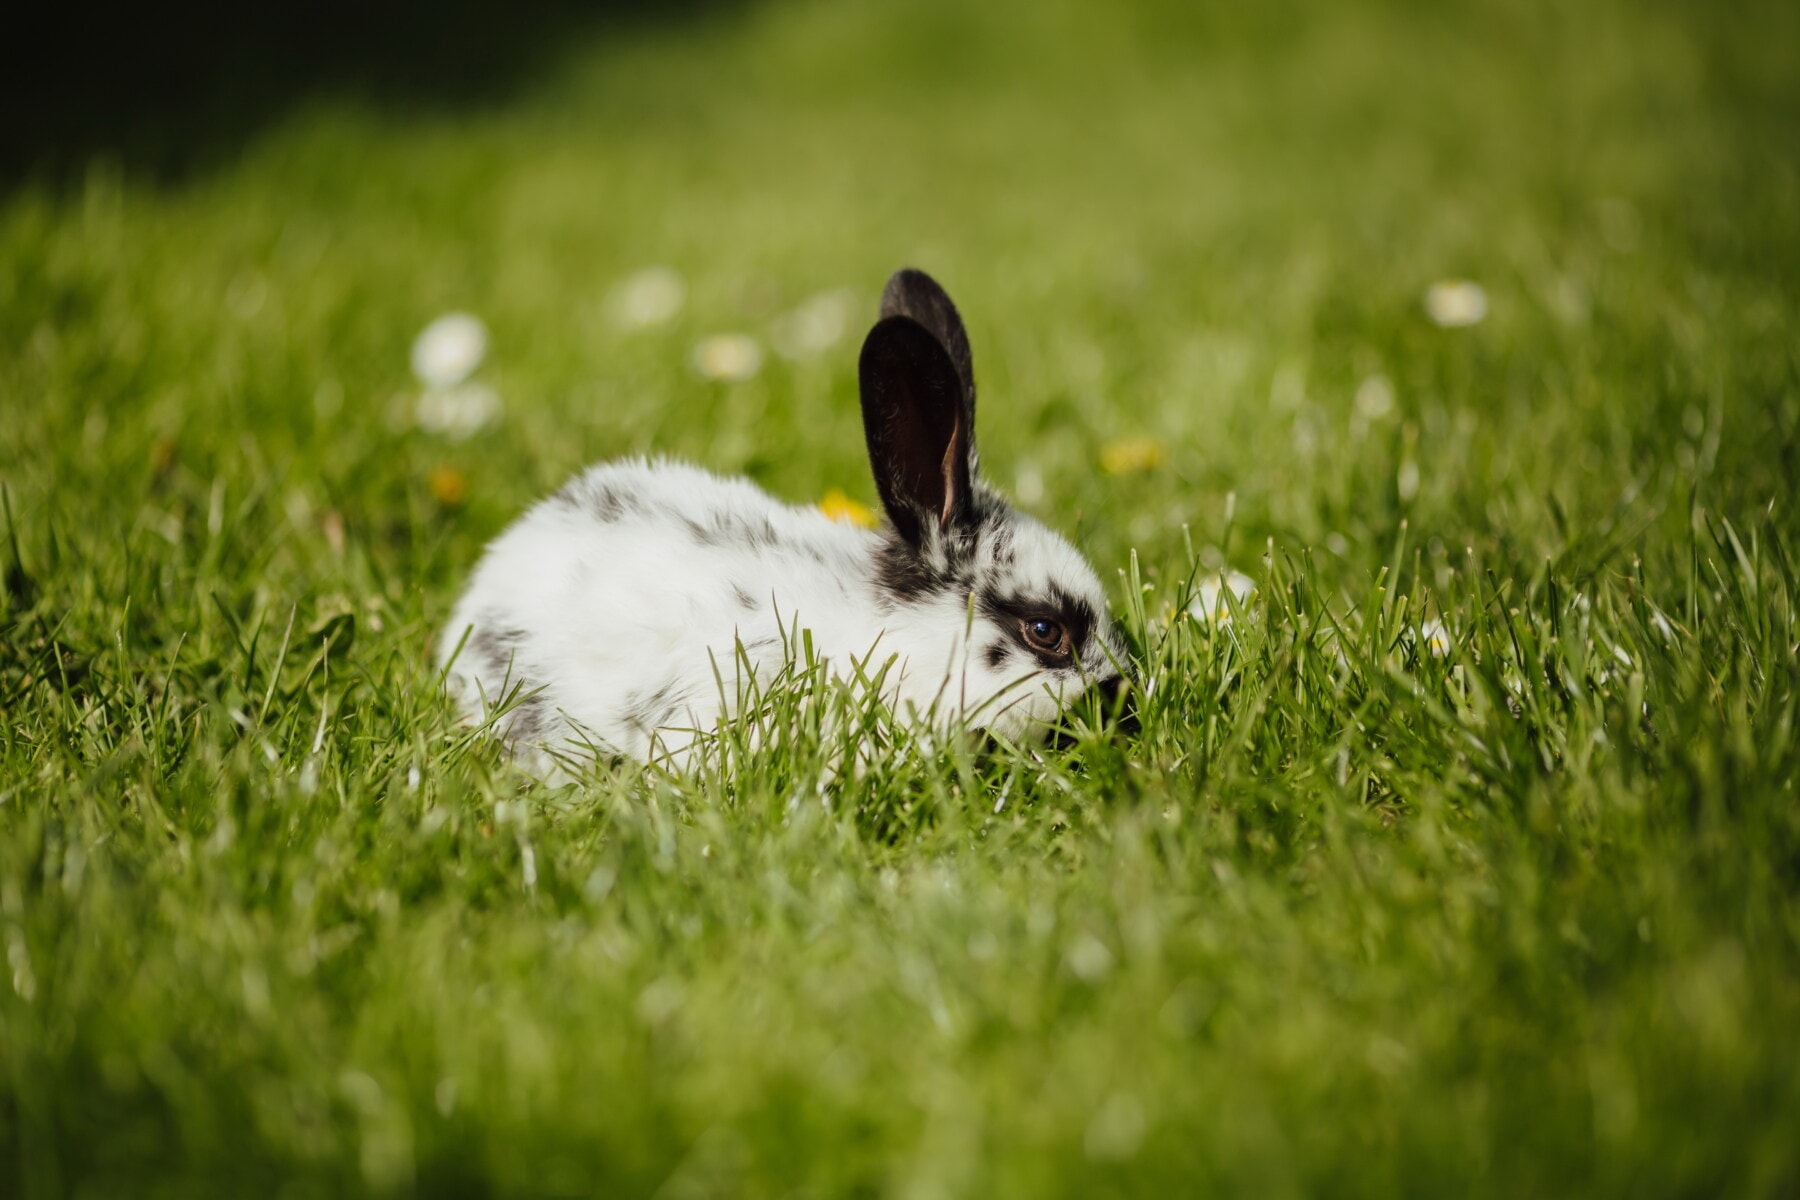 lapin, domestique, animal de compagnie, animal, rongeur, Bunny, herbe, faune, nature, Pâques